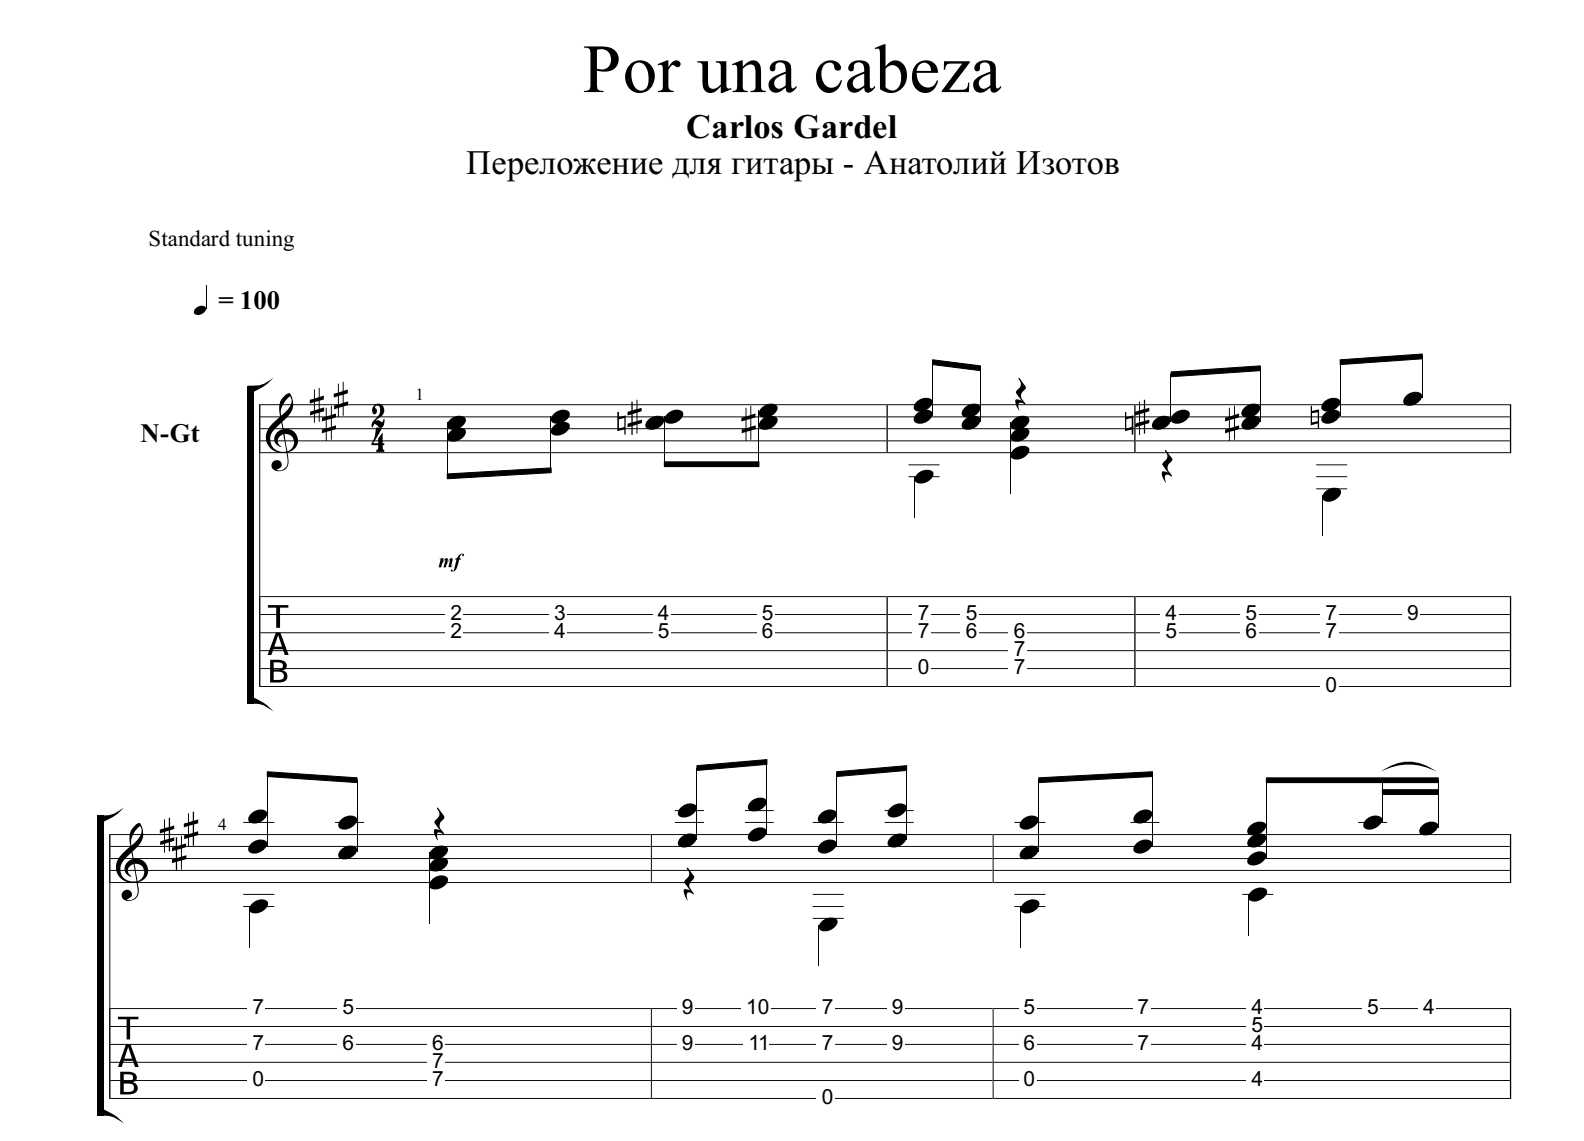 Por una Cabeza for guitar. Guitar sheet music and tabs.